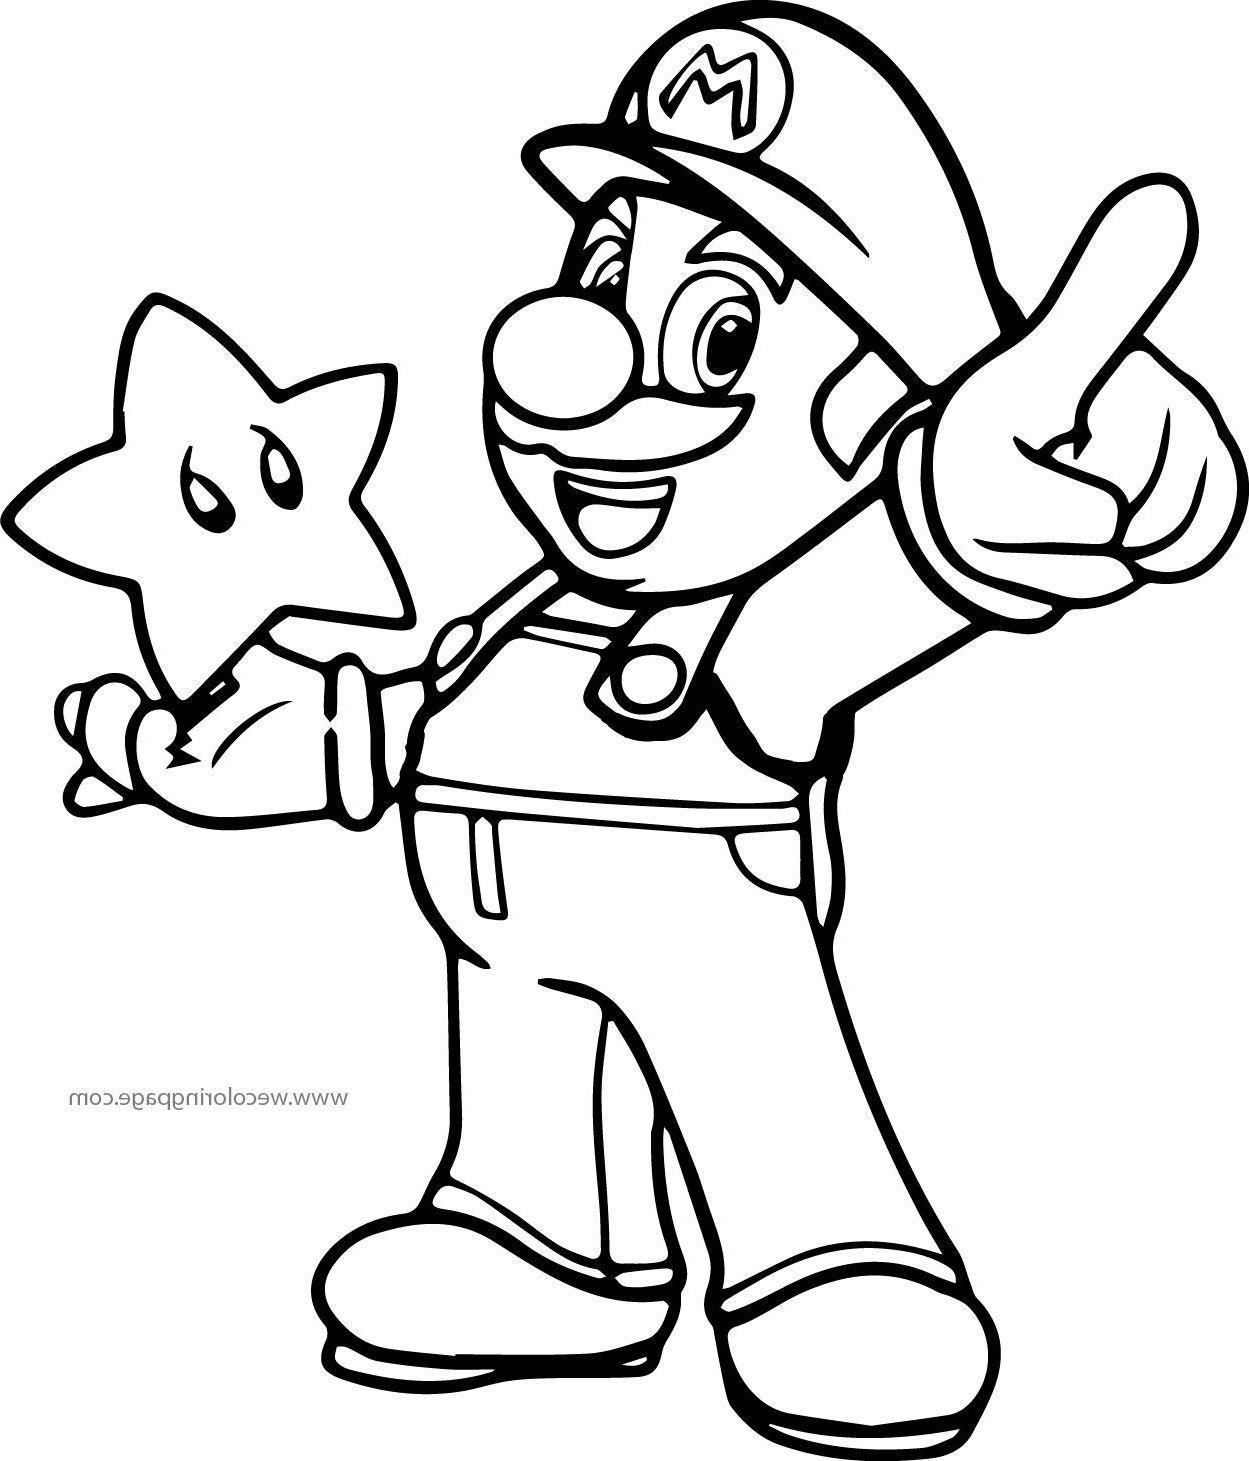 Super Mario Coloring Page Super Mario Coloring Pages Mario Coloring Pages Coloring Pages